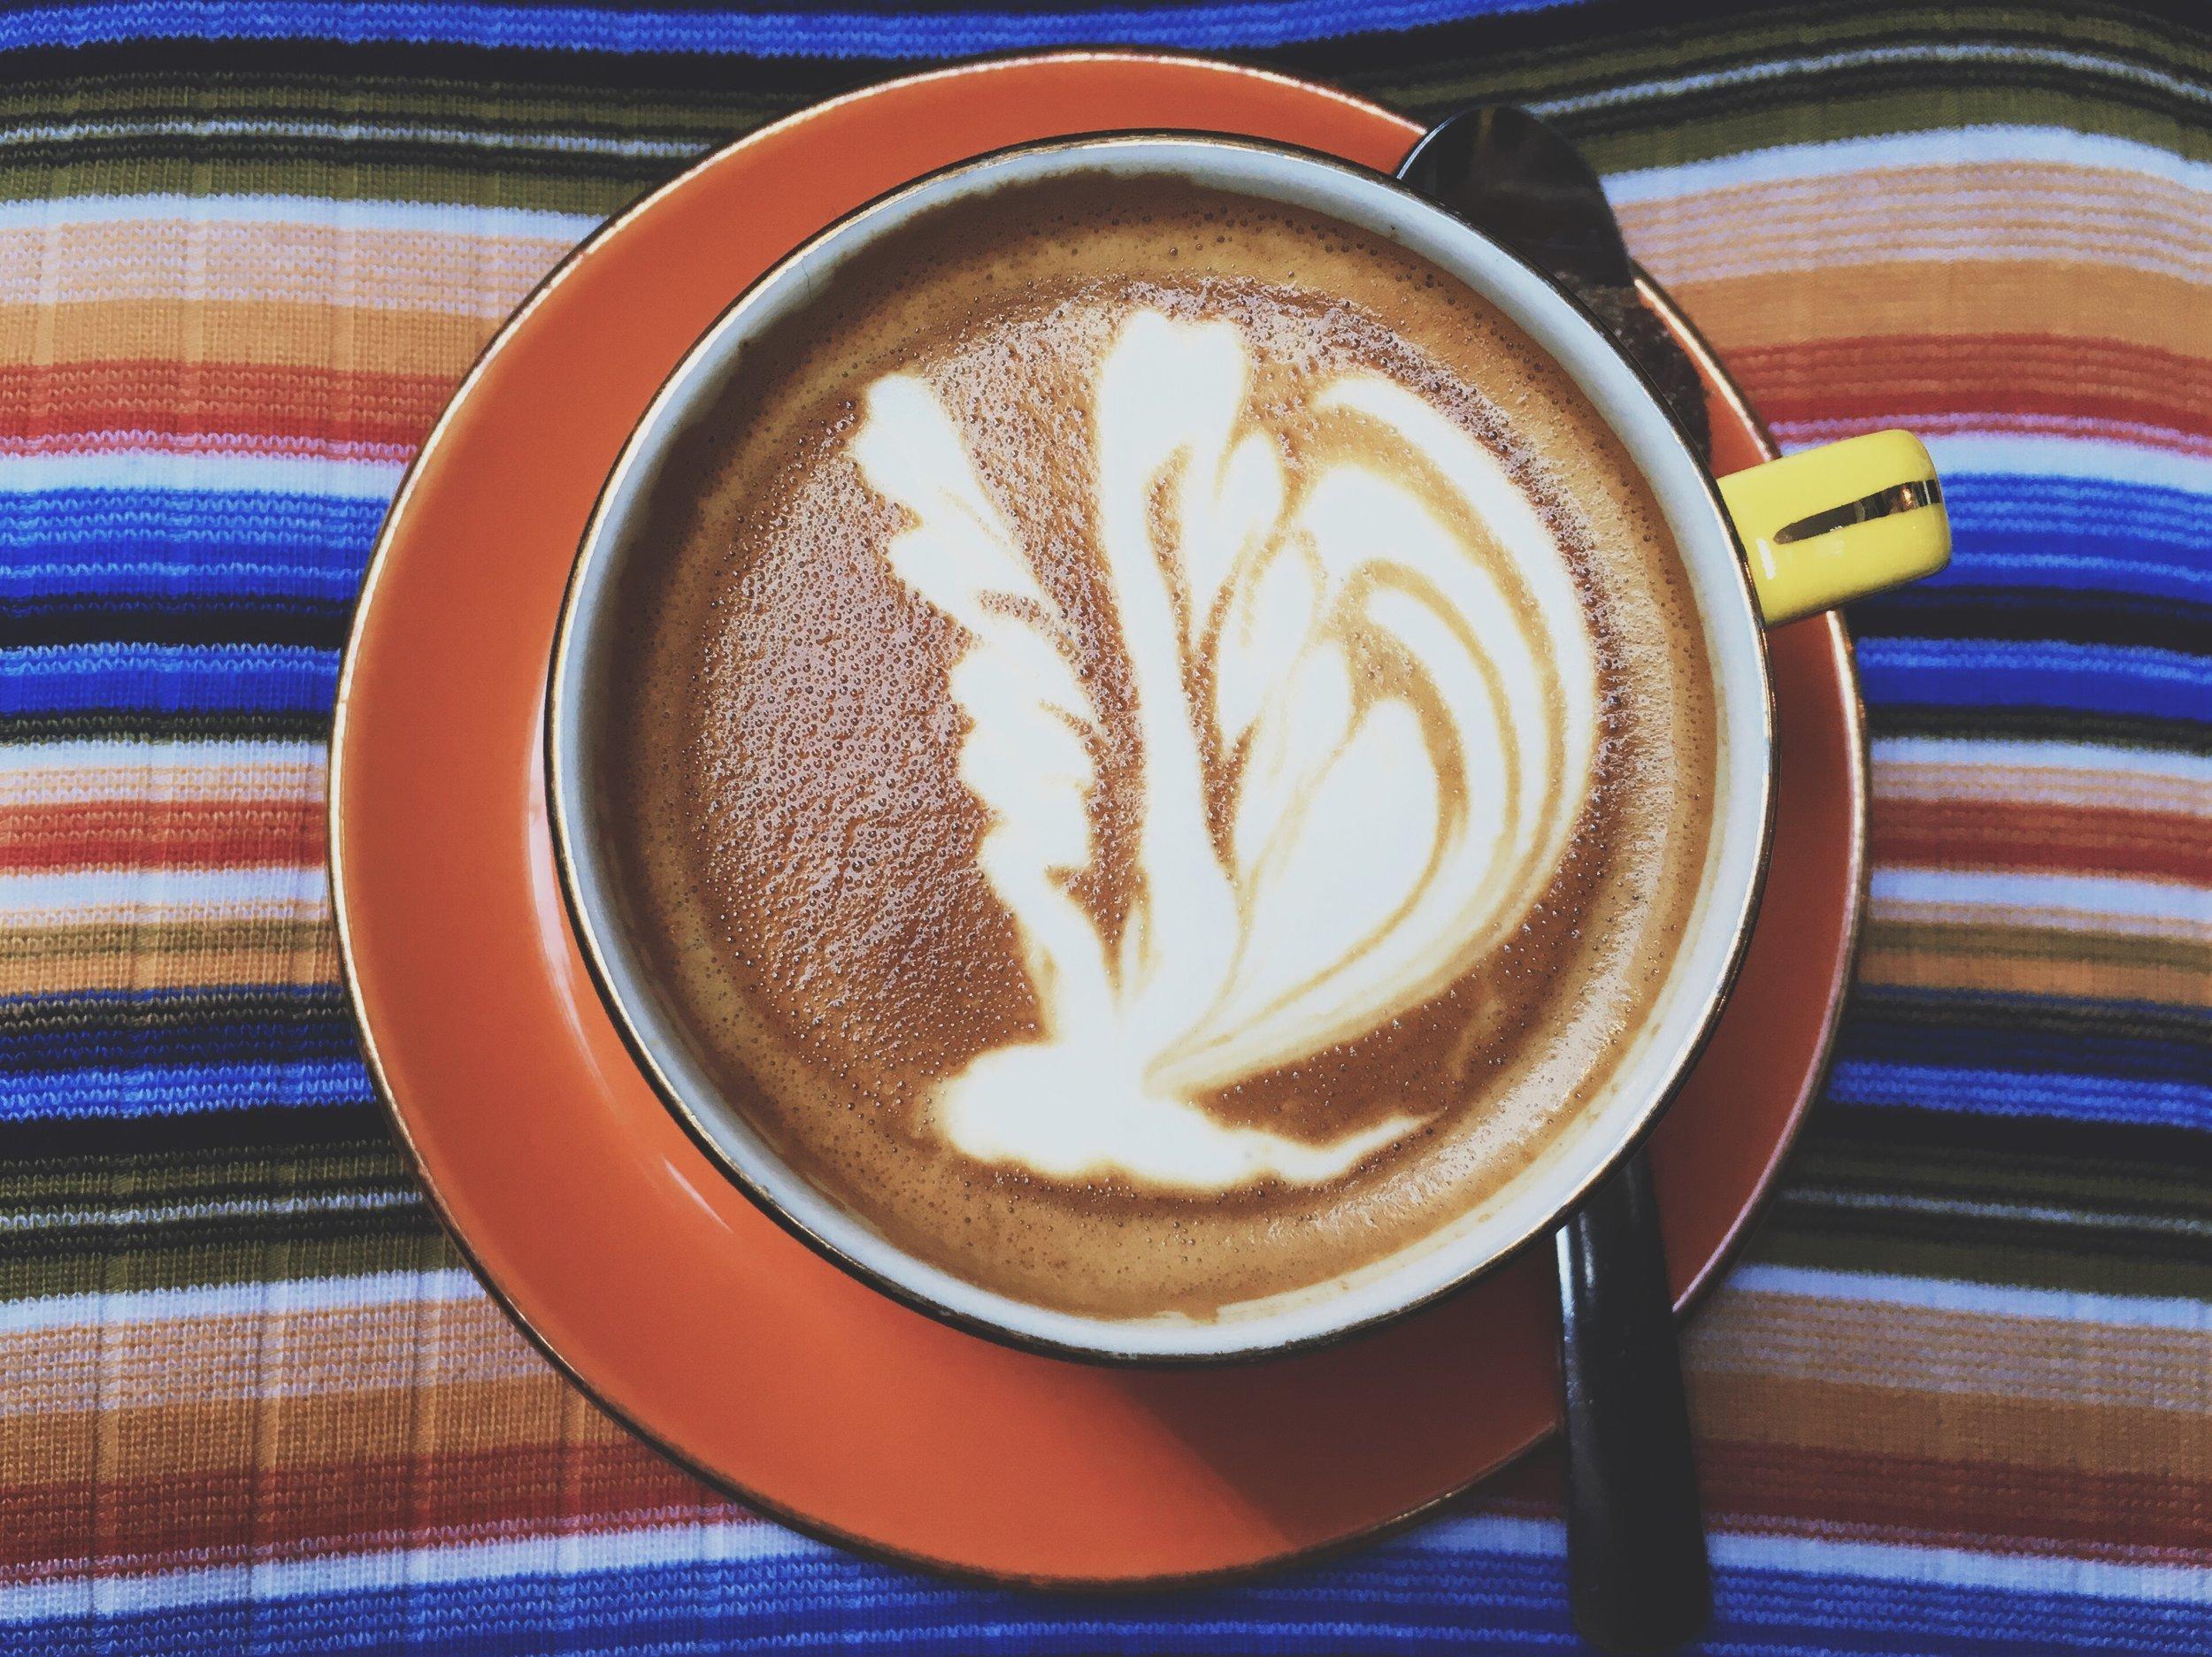 padre coffee at hardware societe